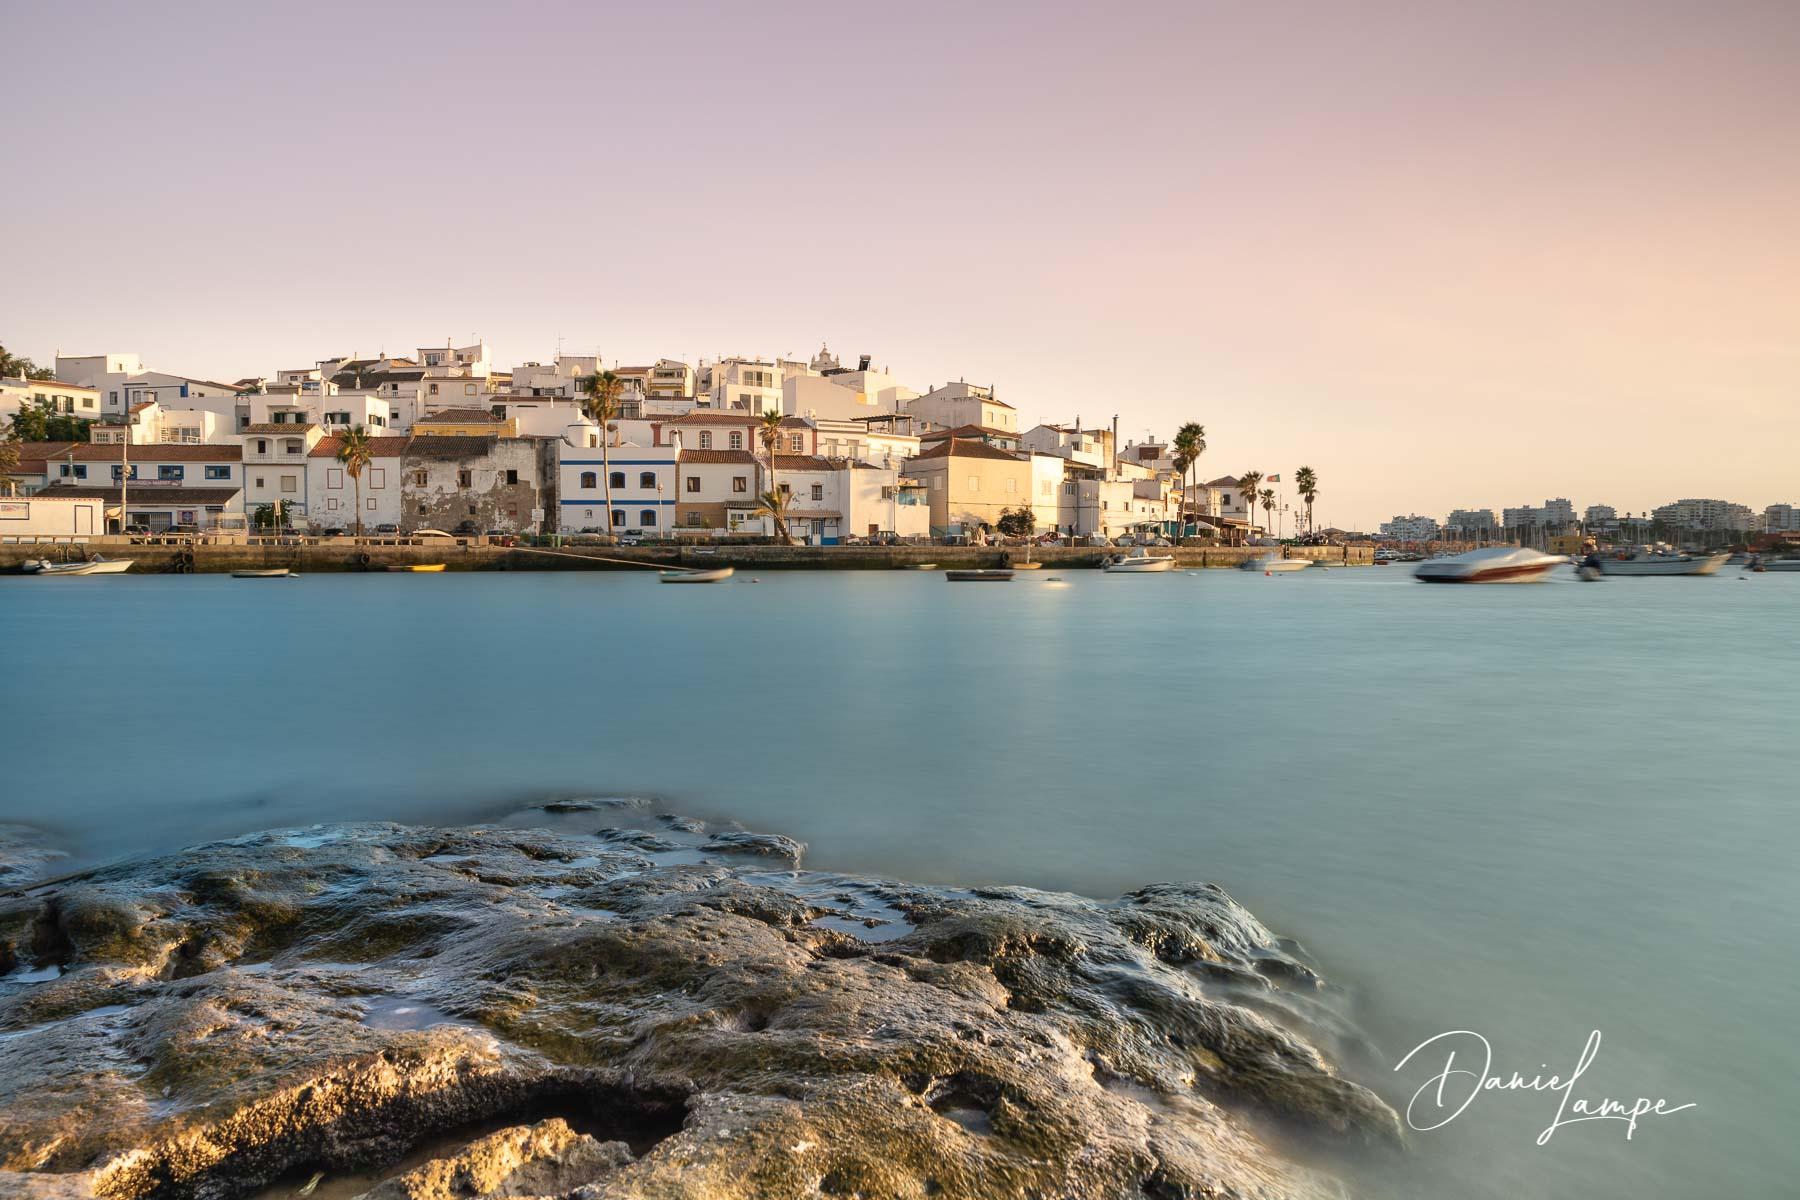 Portugal, Algarve, Ferragudo, Fischerdorf